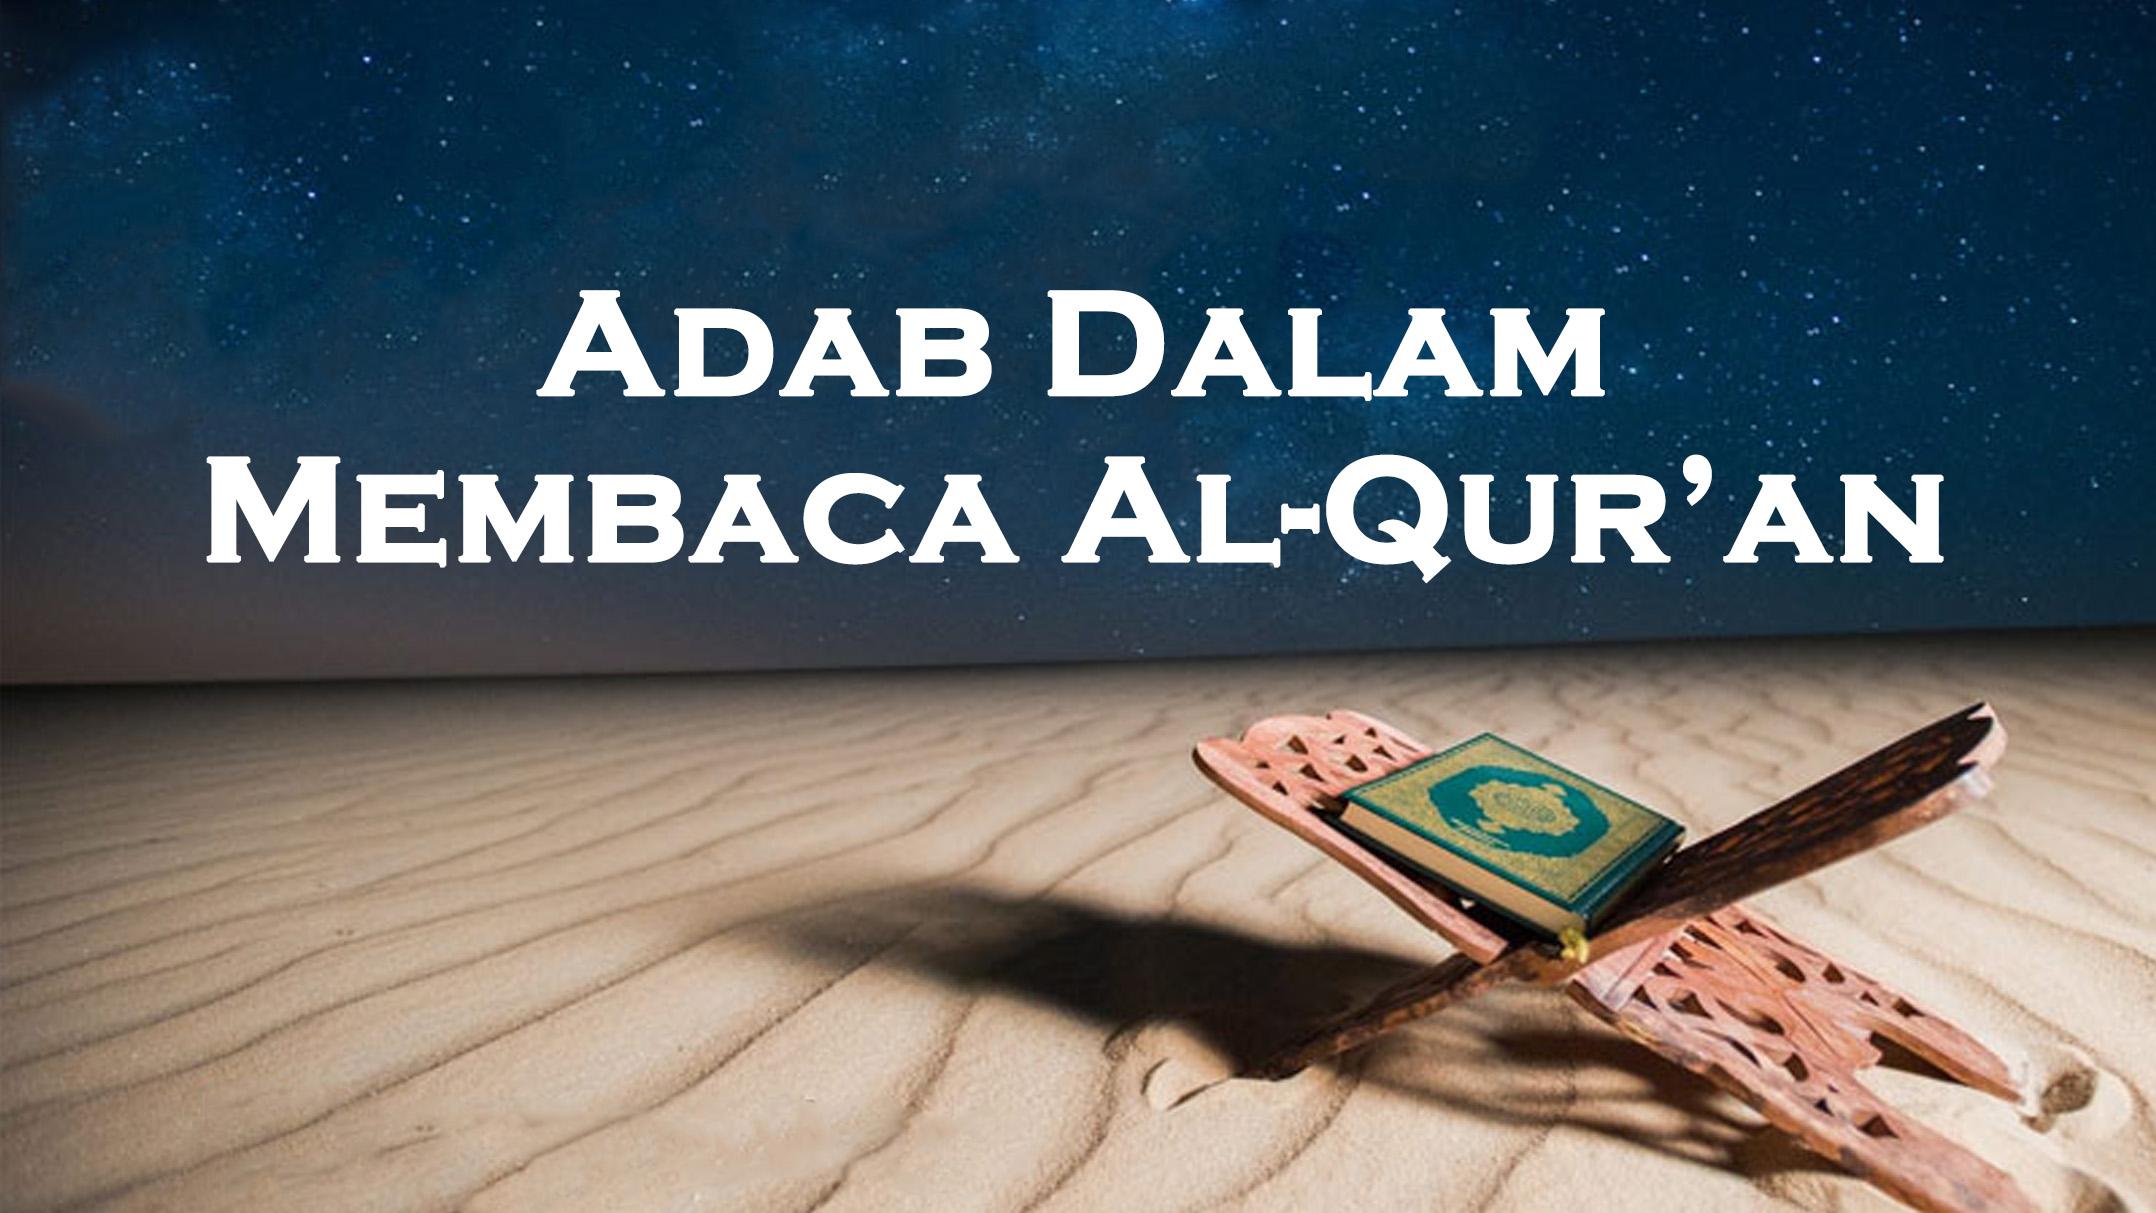 Adab-Adab Dalam Membaca Al-Qur'an